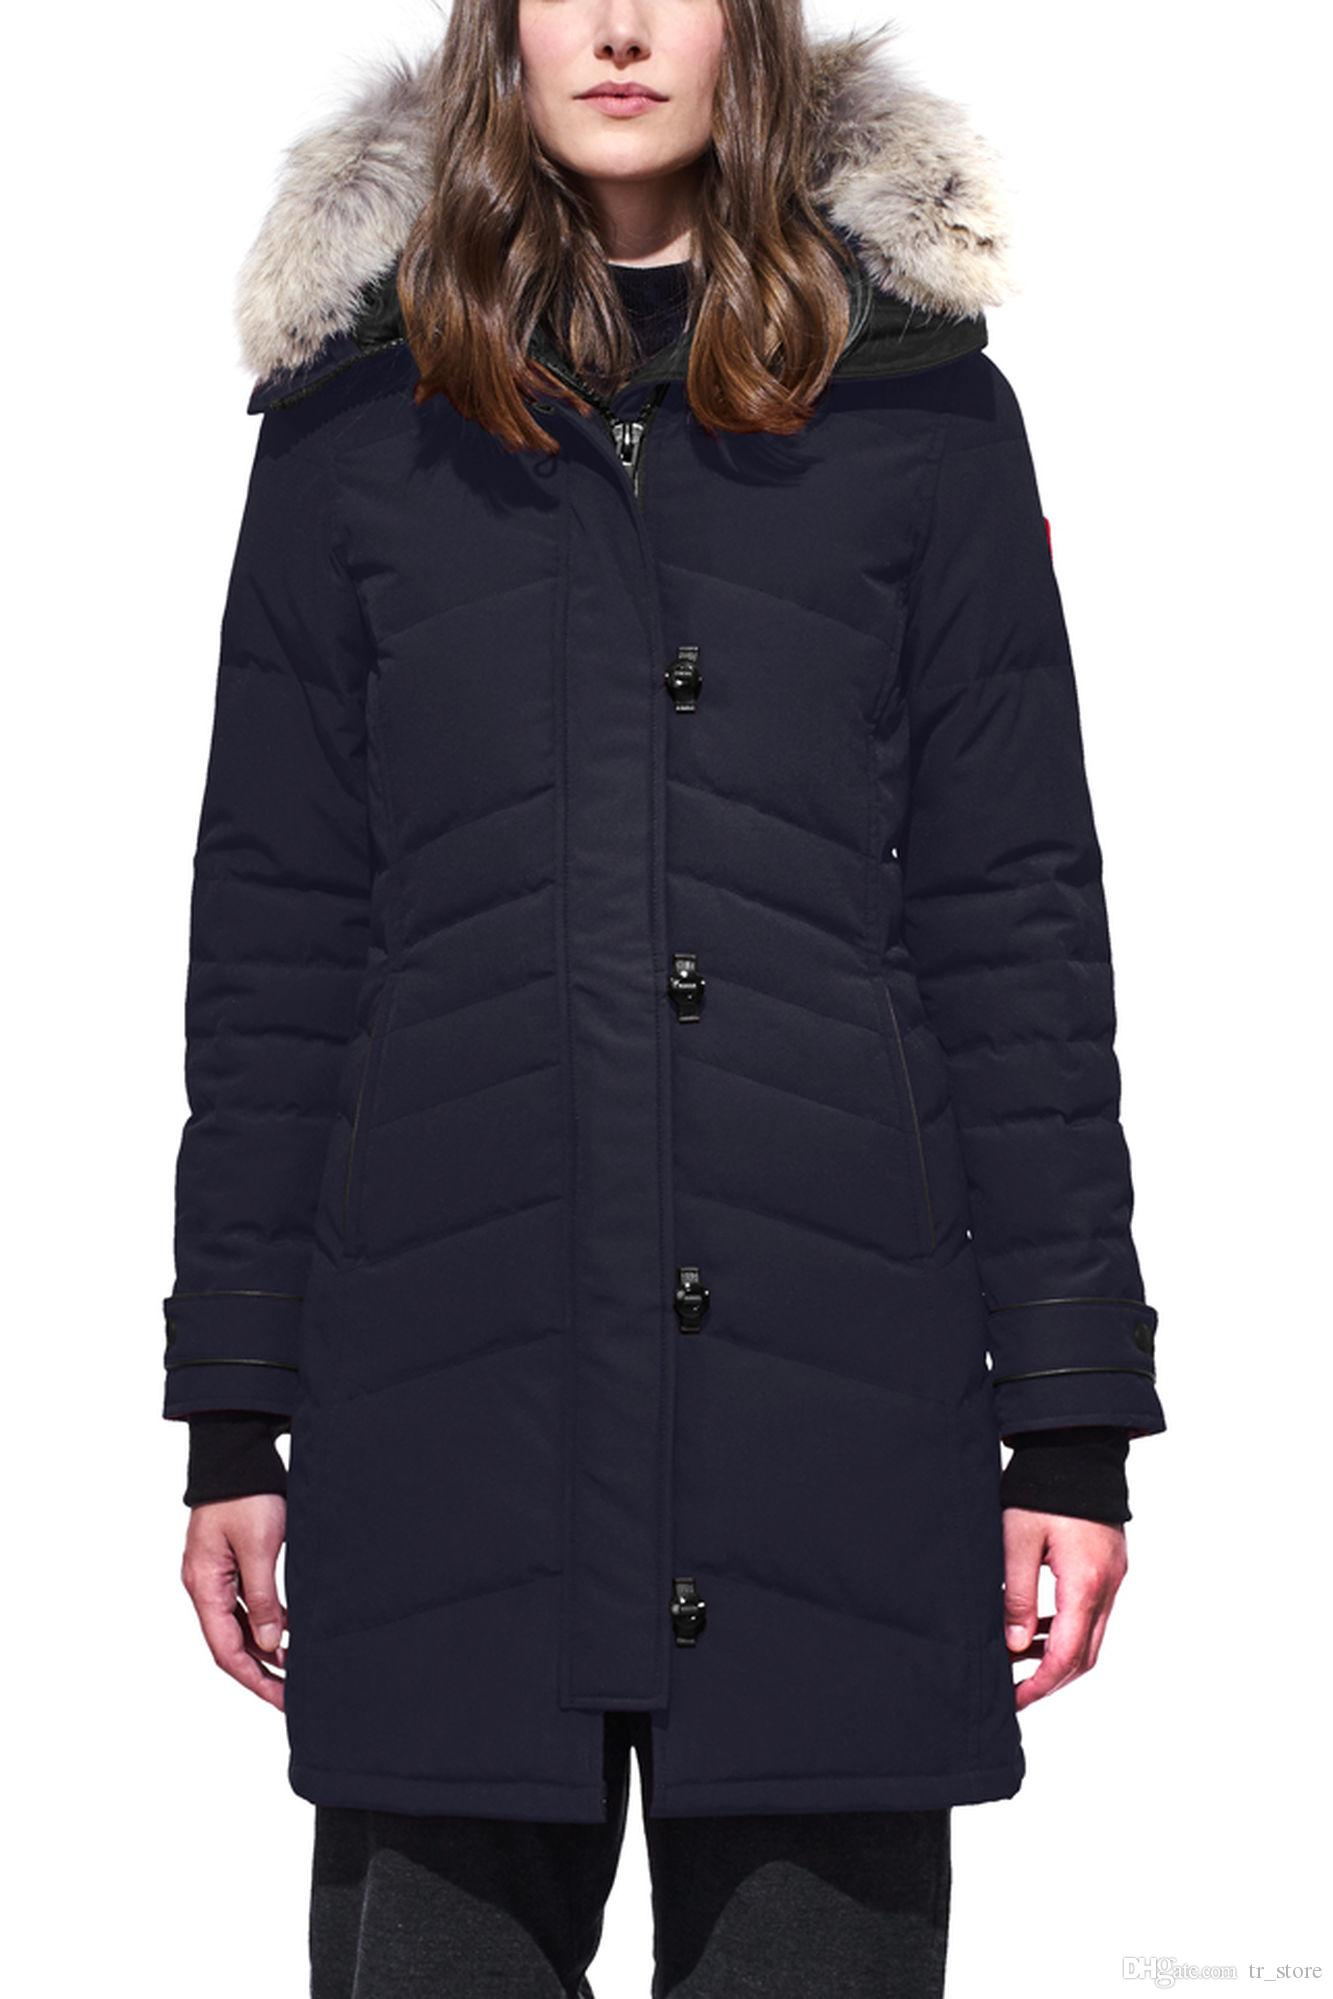 Mujeres Trillium Femme al aire libre chaqueta de piel abajo Hiver grueso cálido a prueba de viento Goose Down Coat espesar Fourrure chaqueta con capucha Manteaus Doudoune Q6